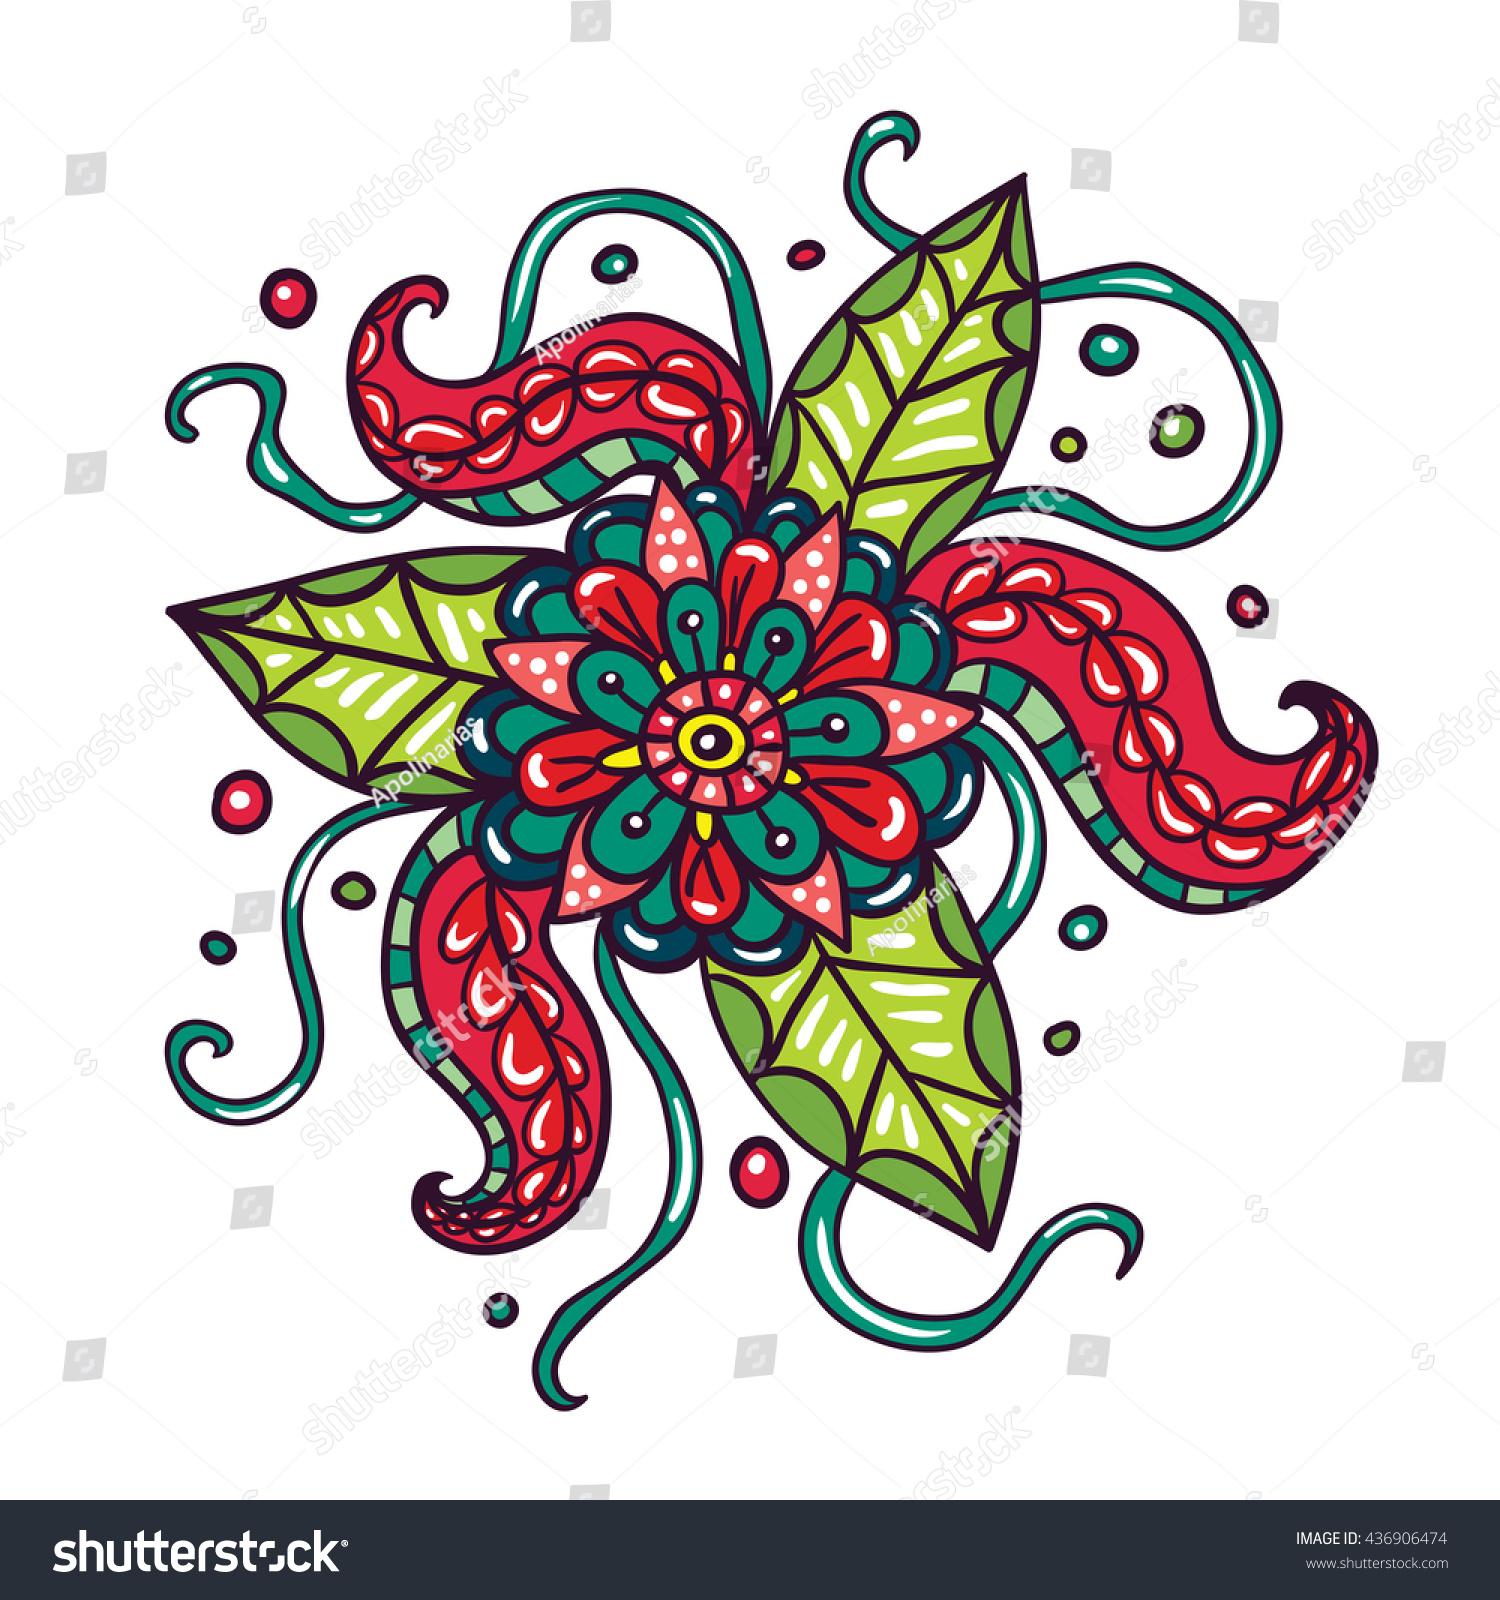 Fictional Flowers Tentacles Illustration On White Stock Photo (Photo ...